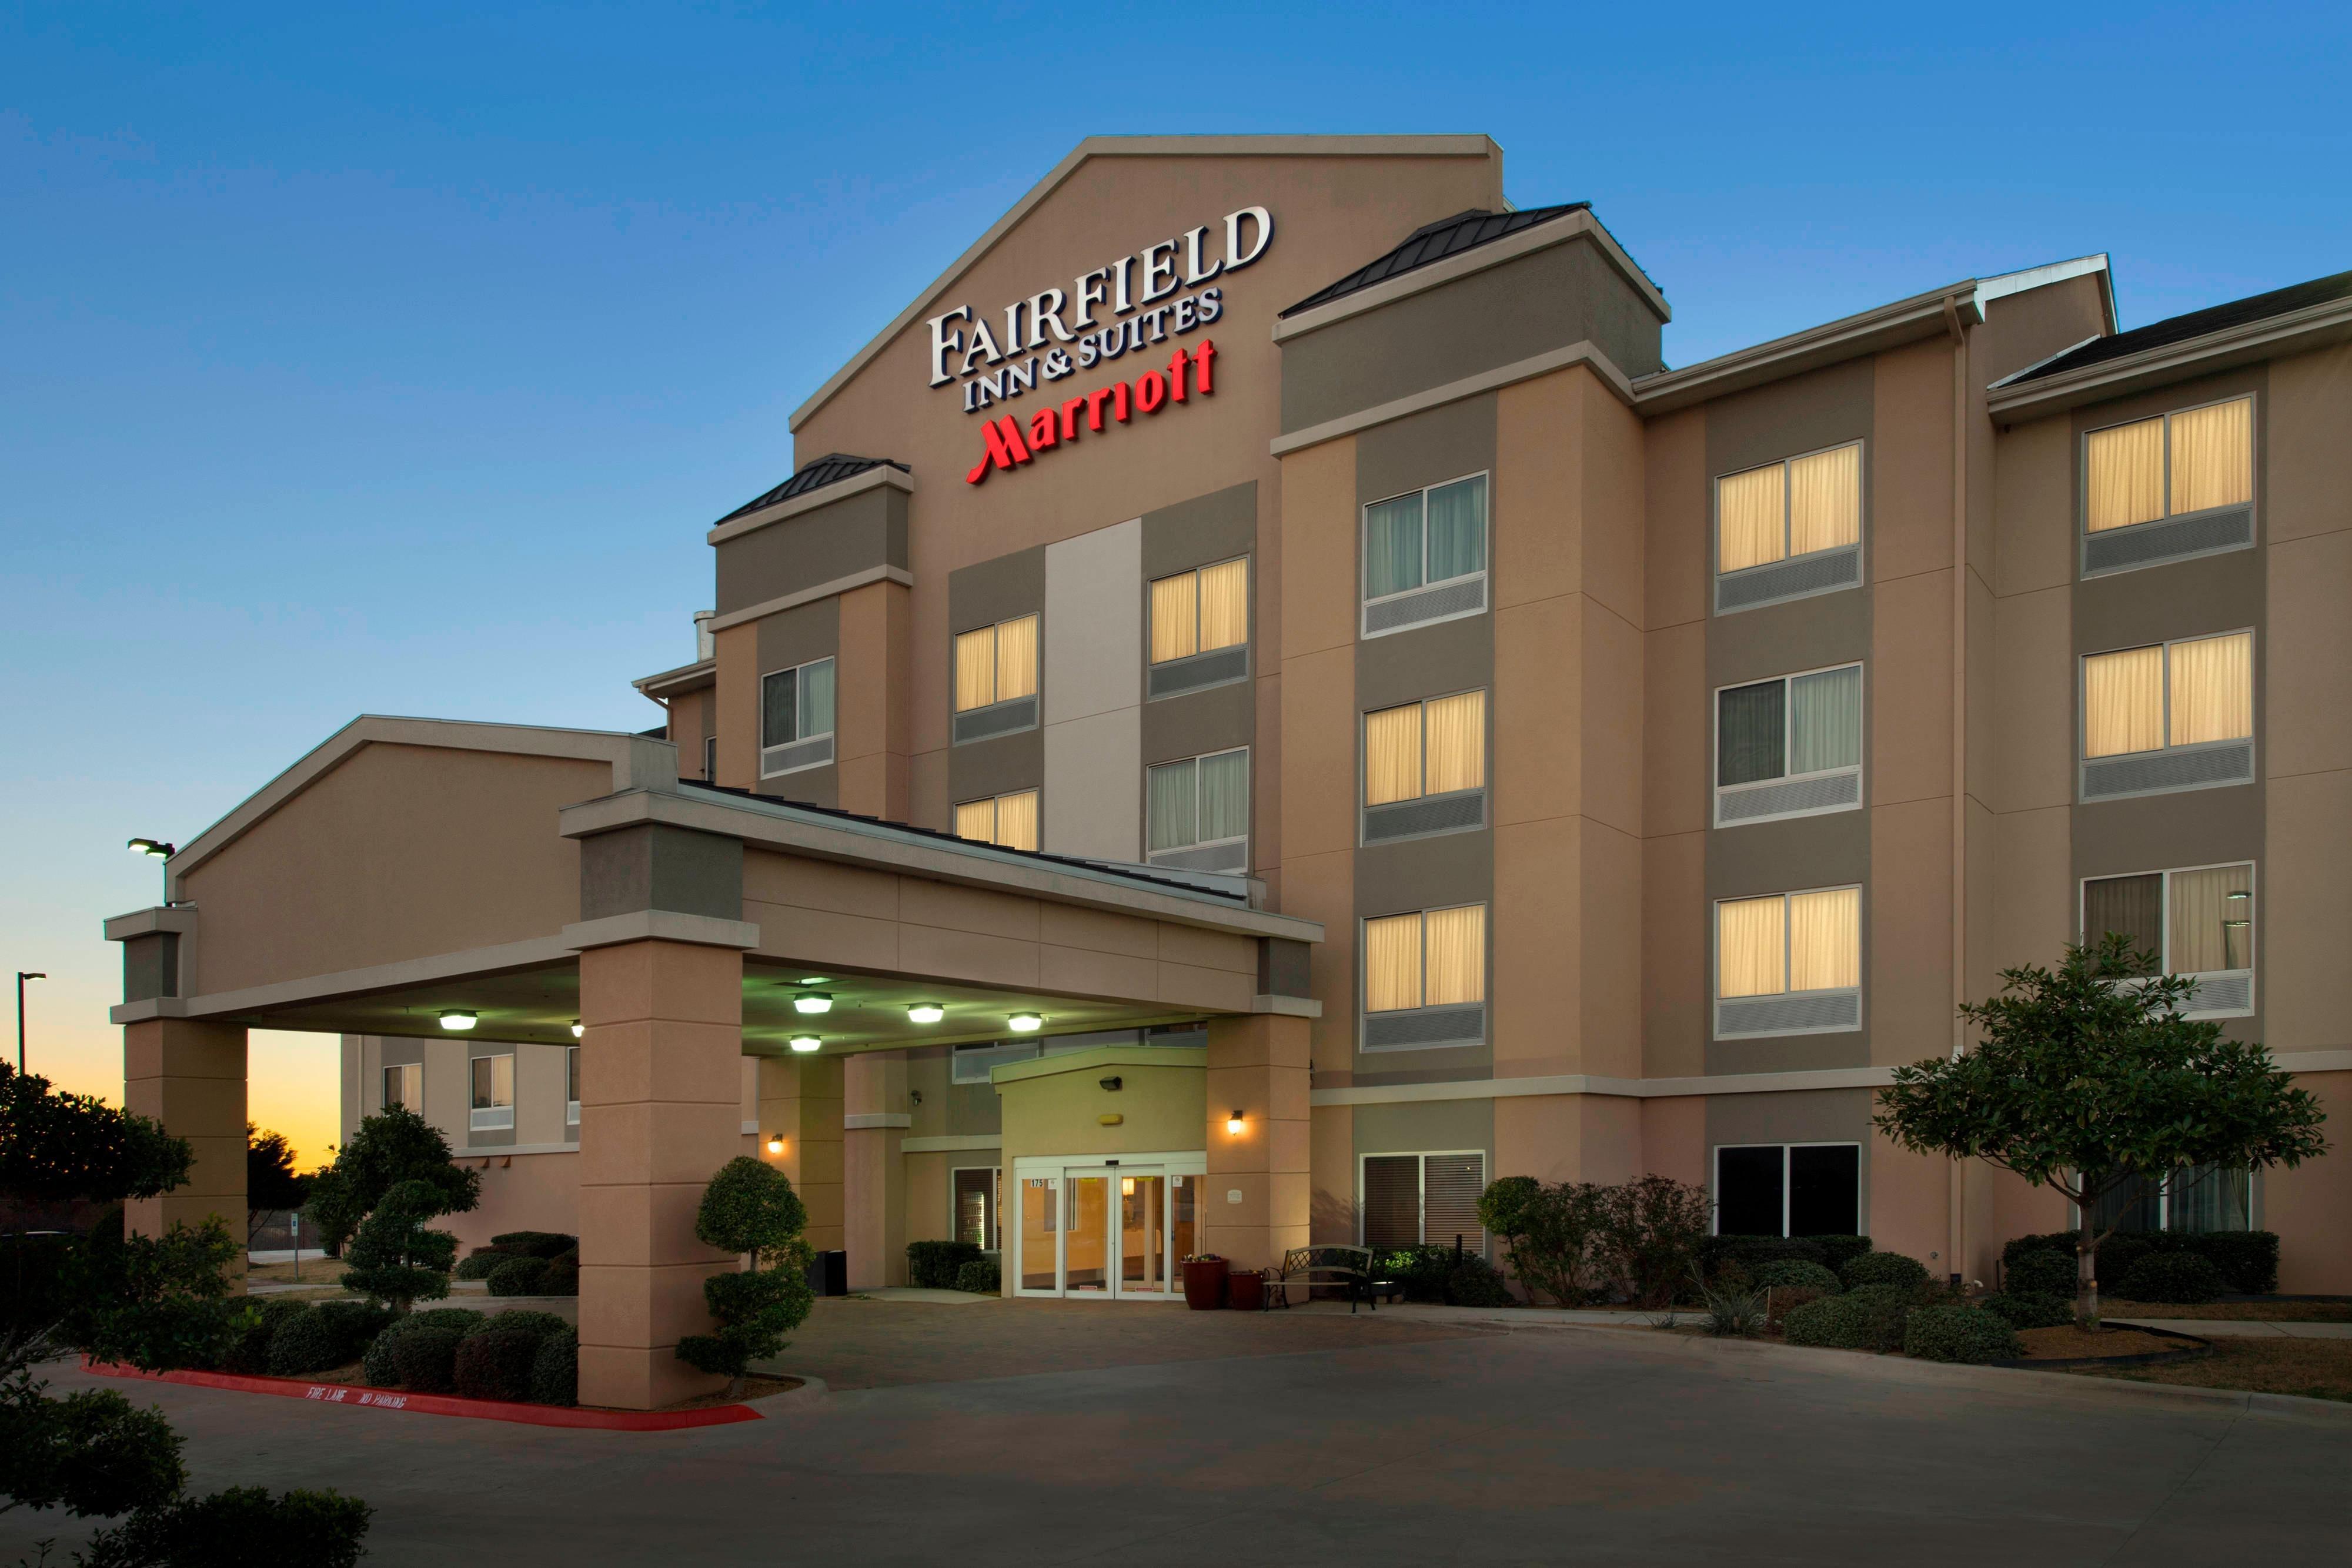 Fairfield by Marriott Weatherford